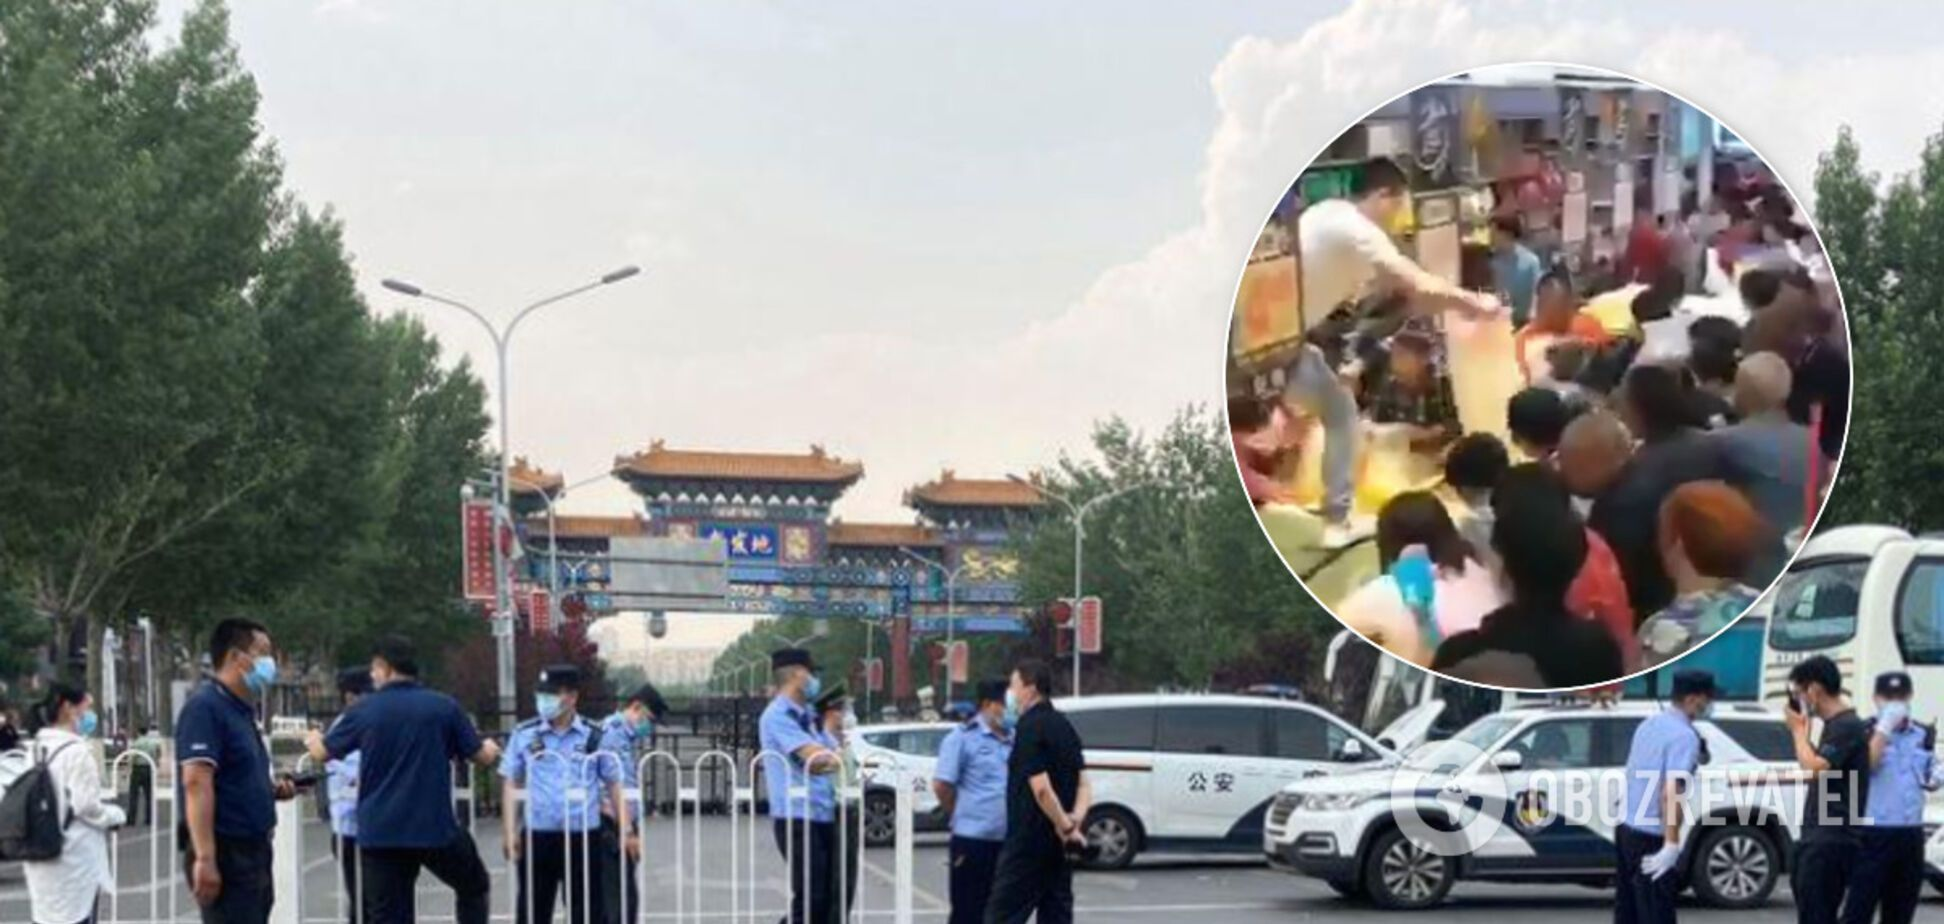 Пекин ввел режим ''военного времени'' из-за вспышки COVID-19: люди атаковали супермаркет. Видео